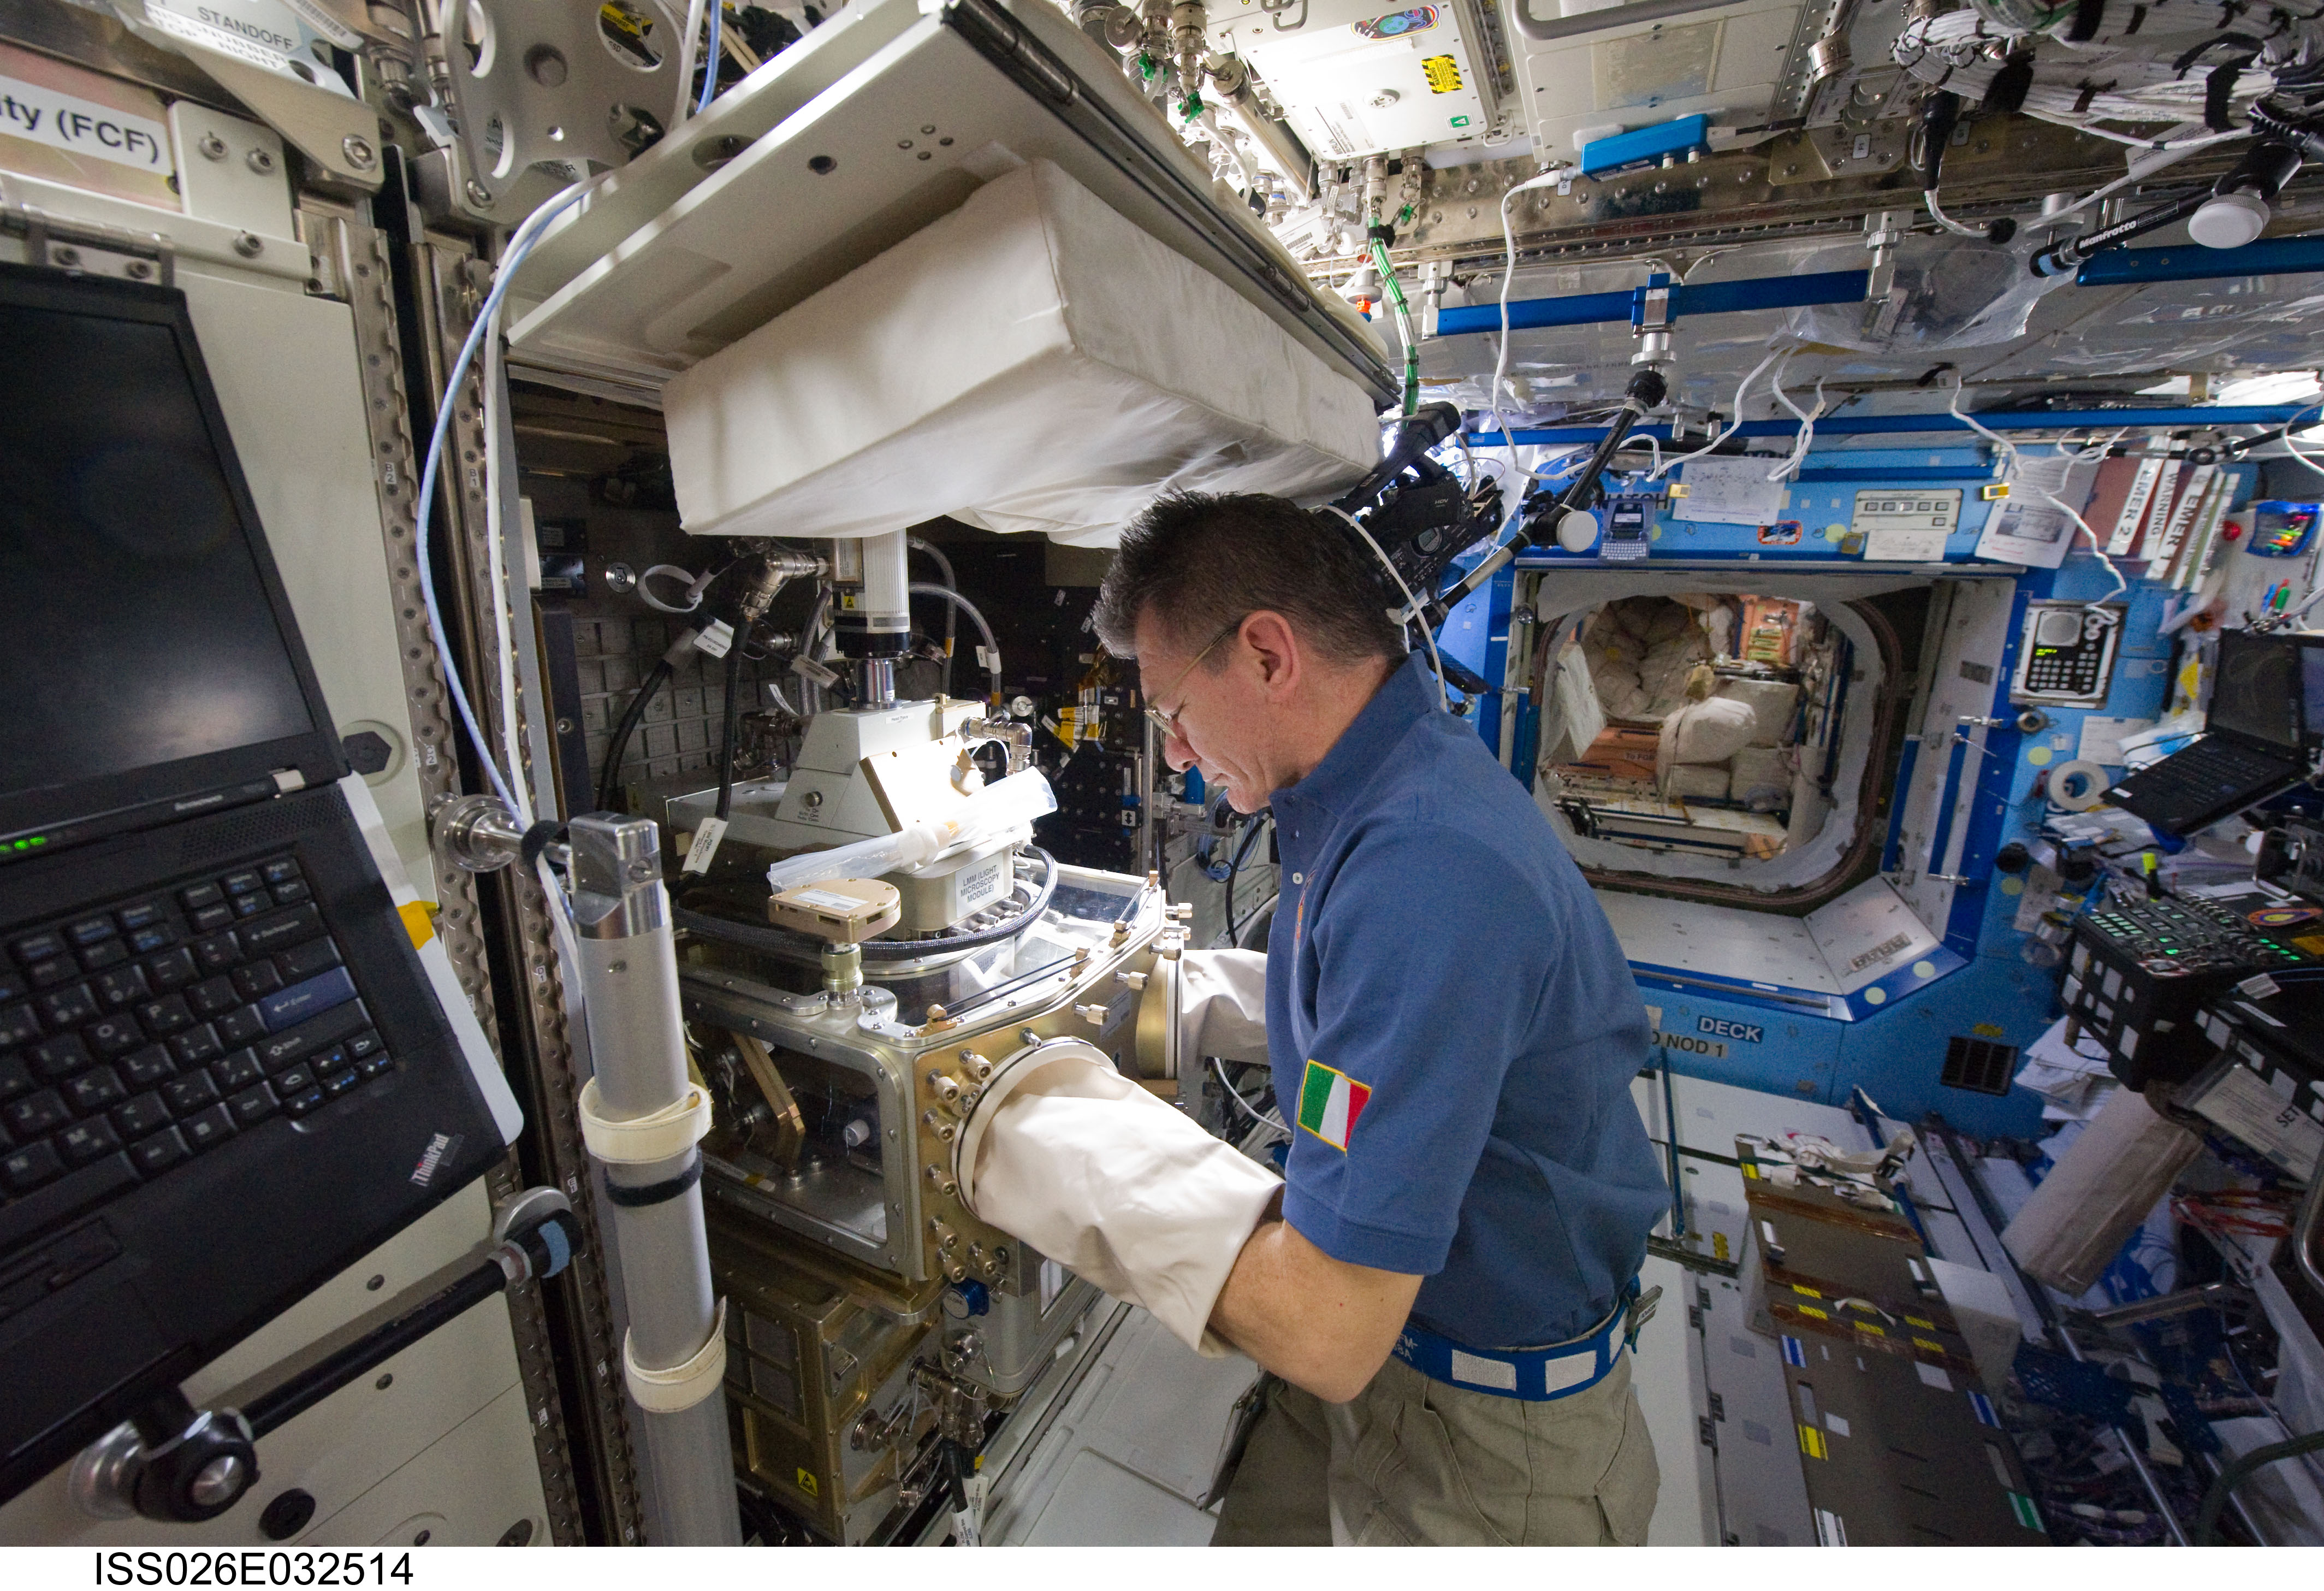 nasa space research - photo #28